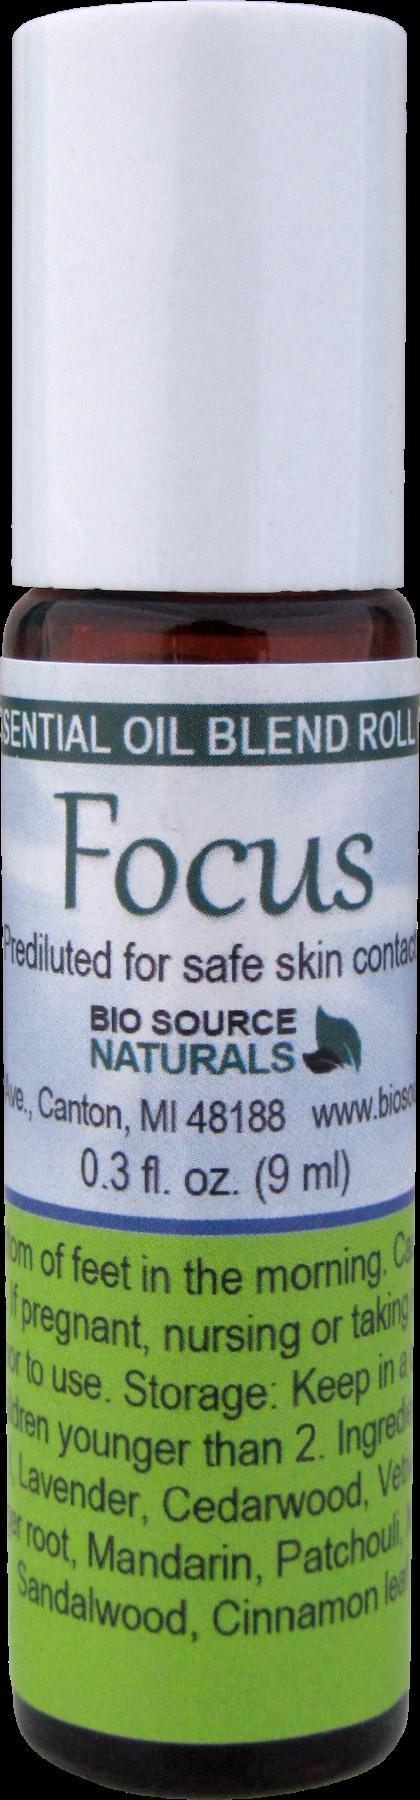 Focus Essential Oil Blend - 0.3 fl oz (9 ml) Roll On BLENDFOCUSR